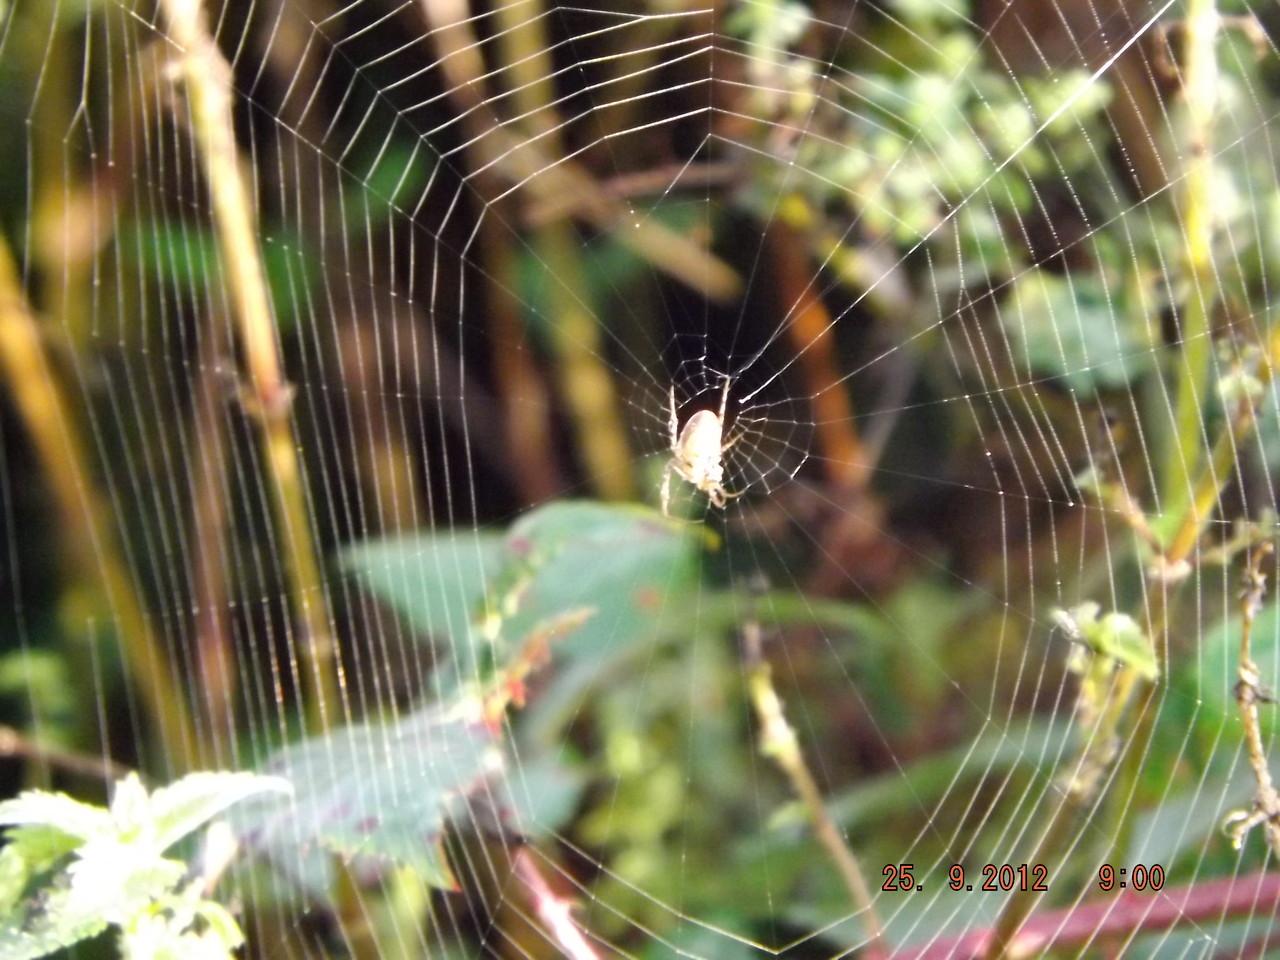 Superbe toile d'araignée